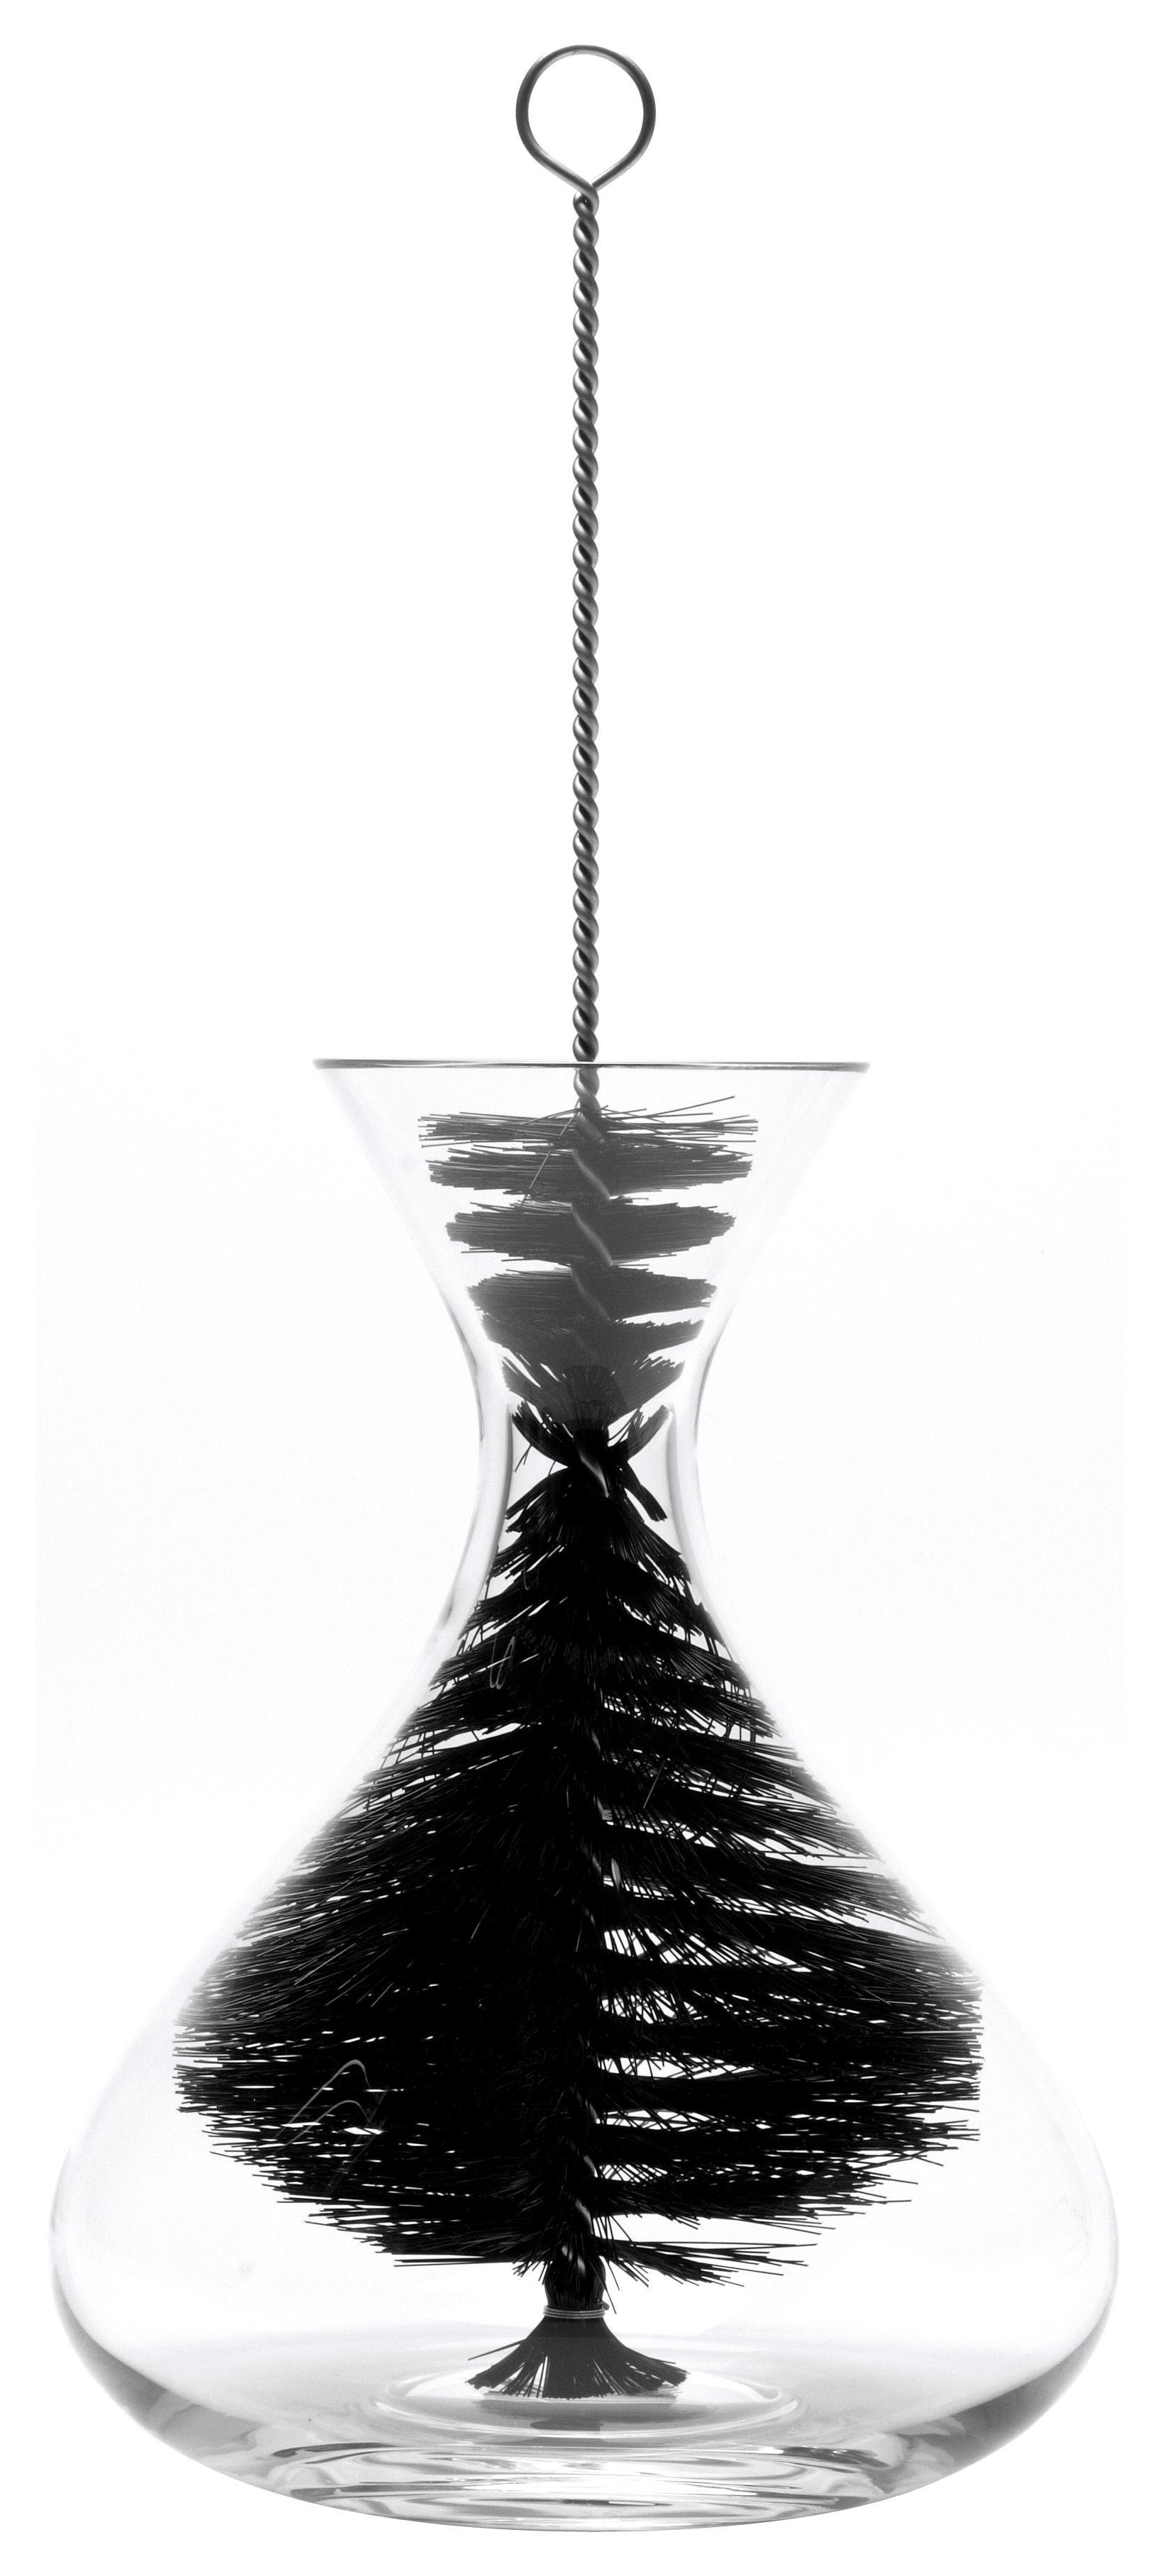 goupillon grand goupillon l 39 atelier du vin noir ebay. Black Bedroom Furniture Sets. Home Design Ideas